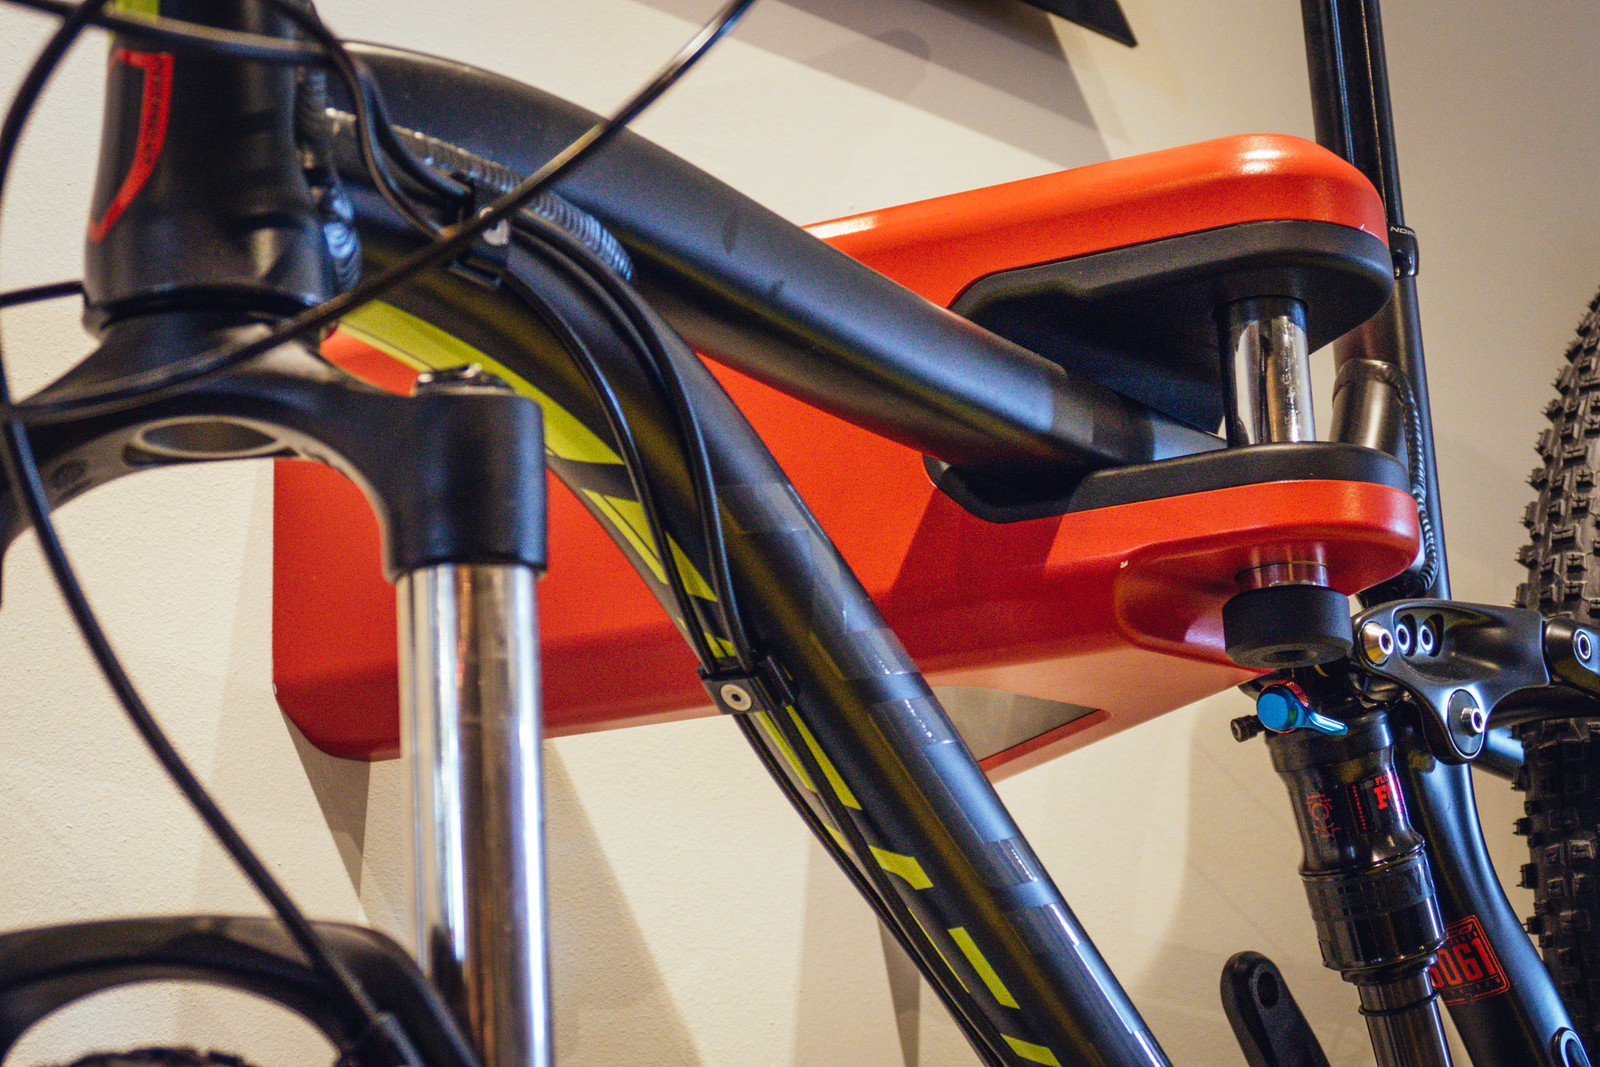 Airlok Wall Mount Bike Rack - EUROBIKE - 2017 Mountain Bike Components - Mountain Biking Pictures - Vital MTB